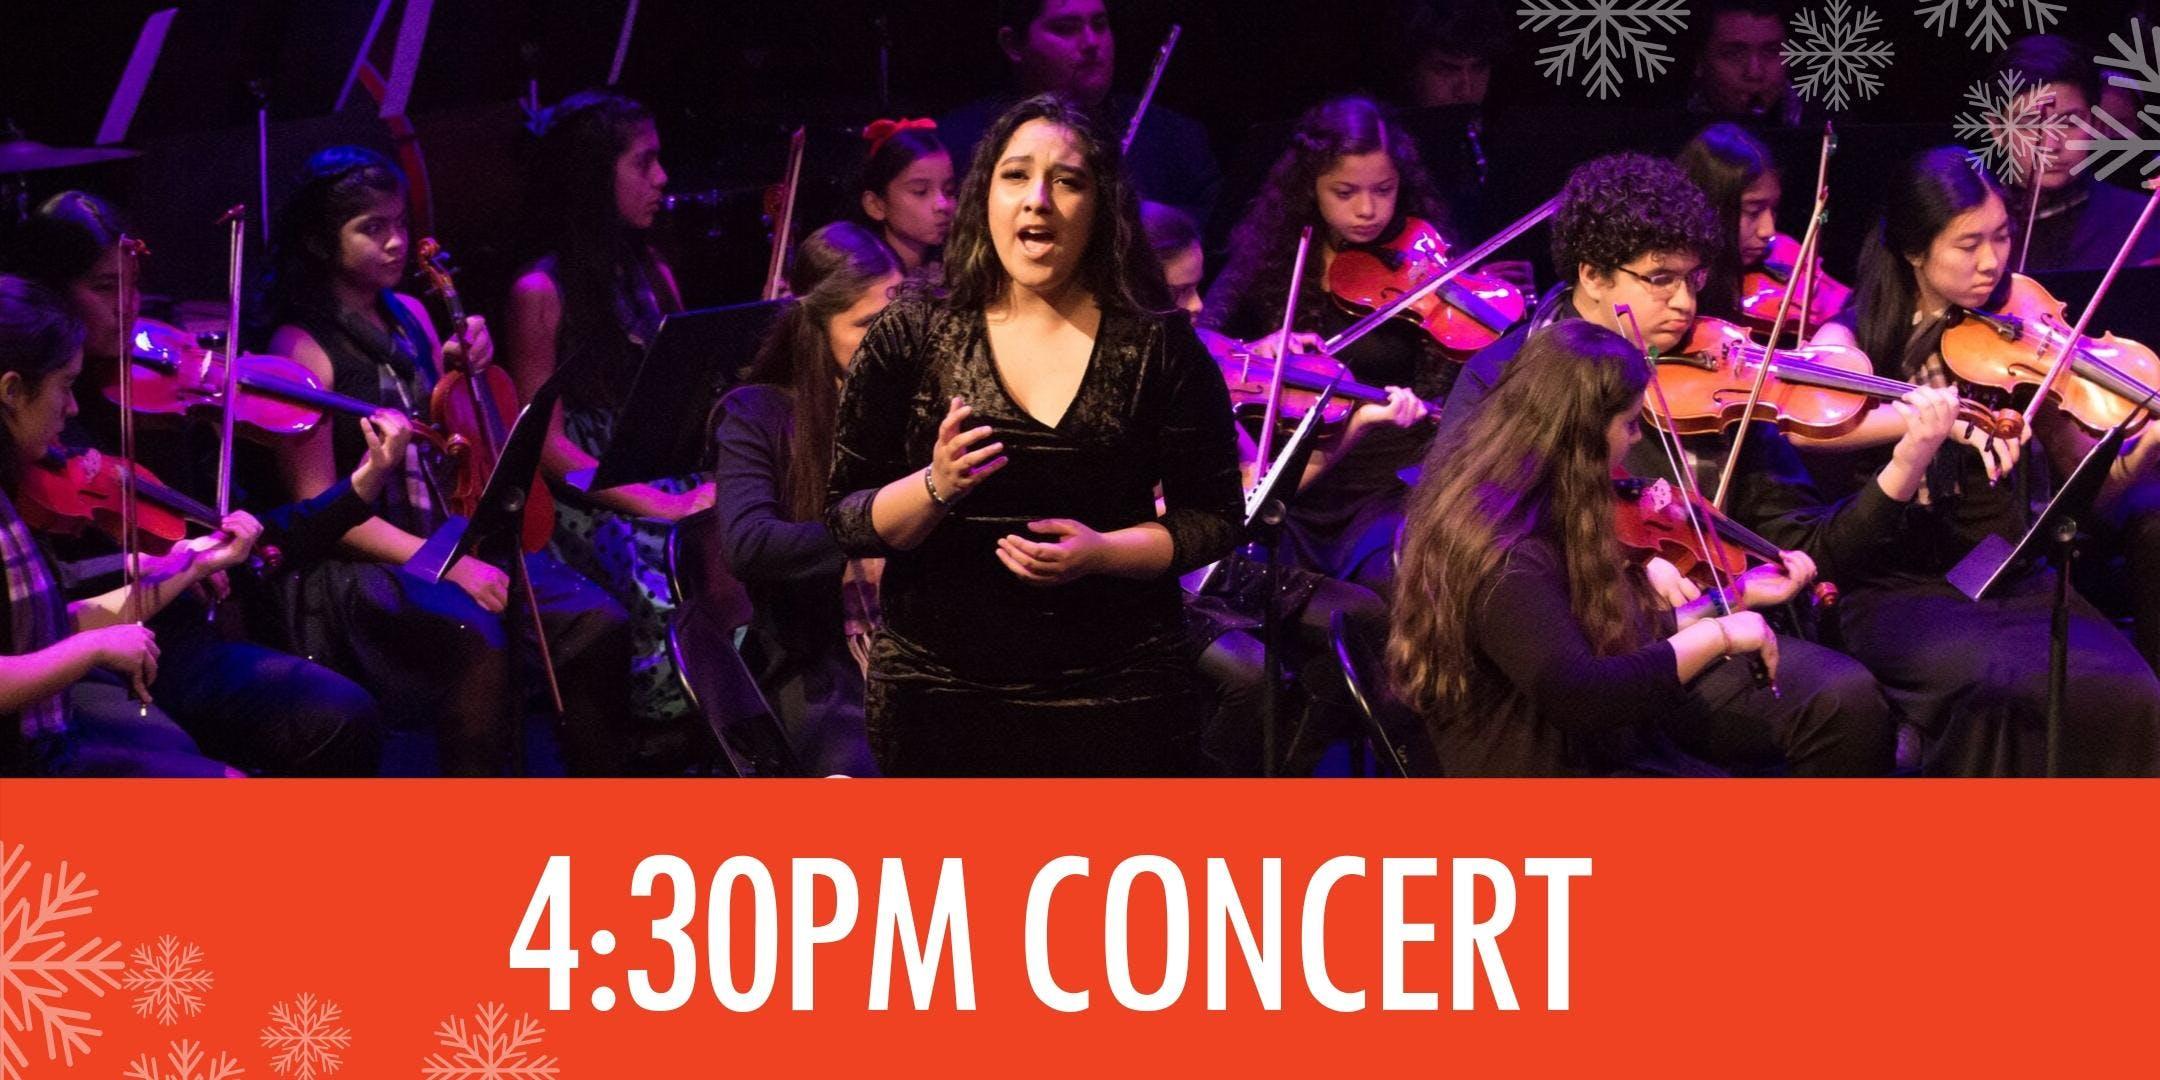 Elac Winter 2020.Lamusart Winter Concert 2019 4 30pm At East Los Angeles